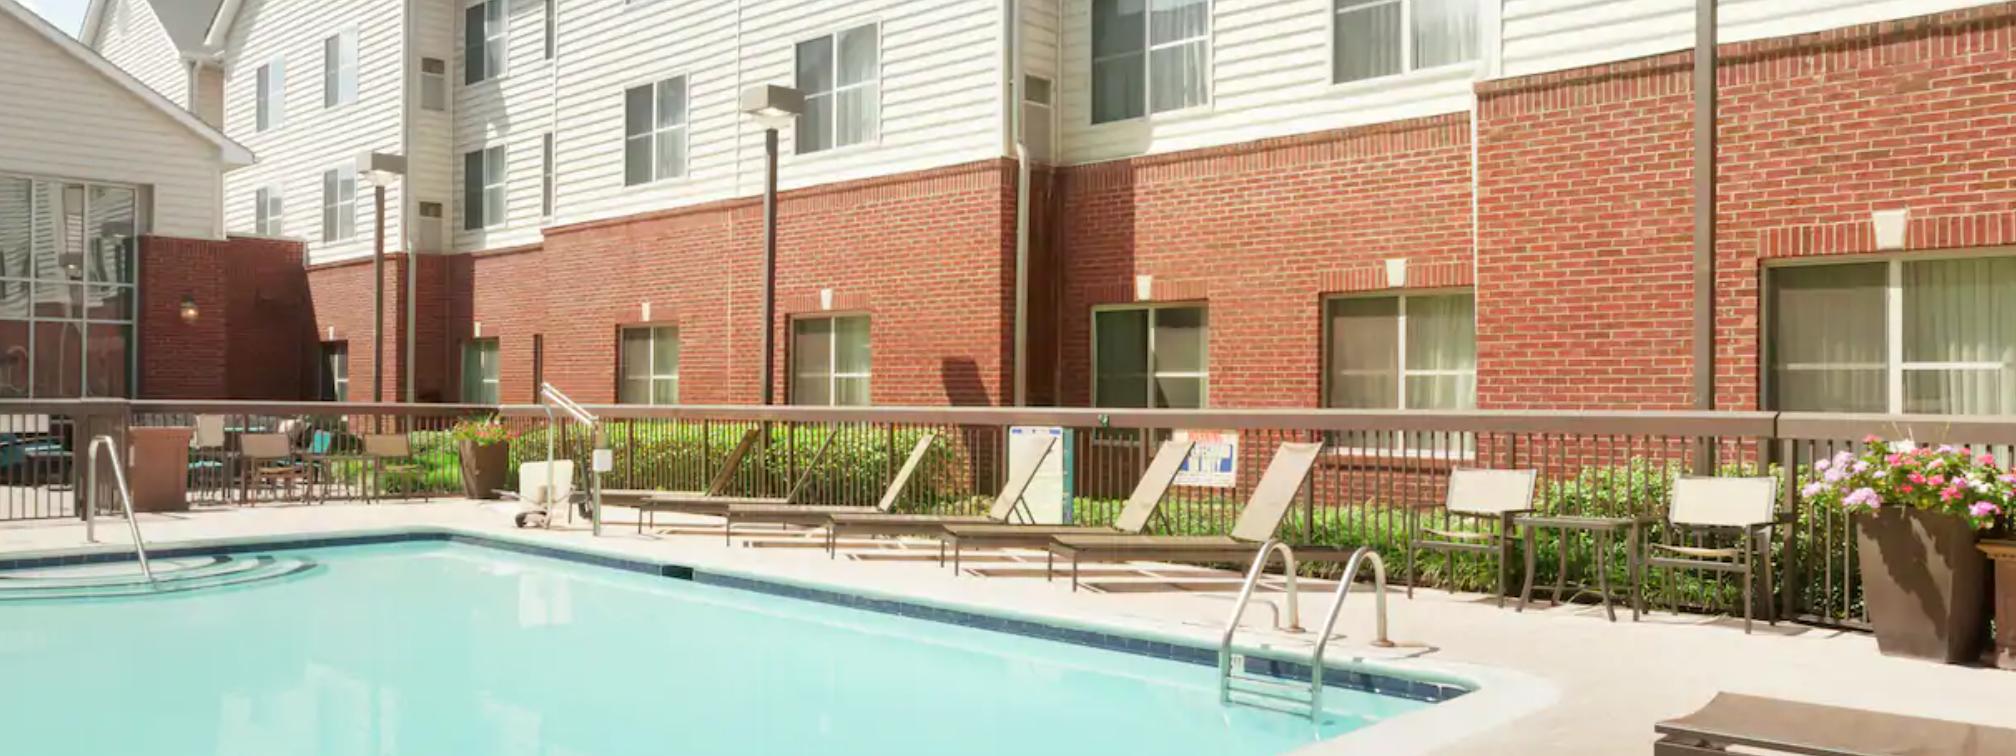 https://www.hotelsbyday.com/_data/default-hotel_image/3/18209/screenshot-2020-06-11-at-4-25-23-pm.png